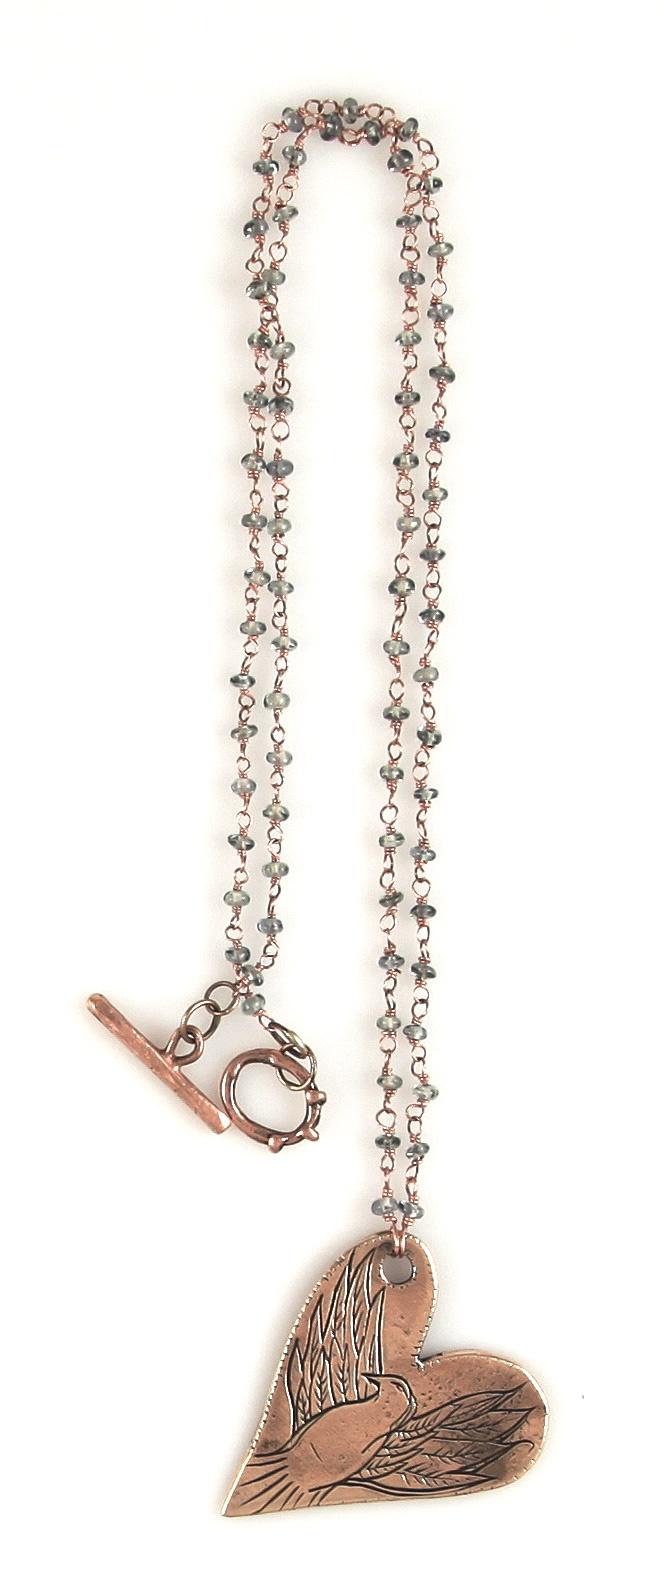 Firen Necklace | Jes MaHarry Jewelry